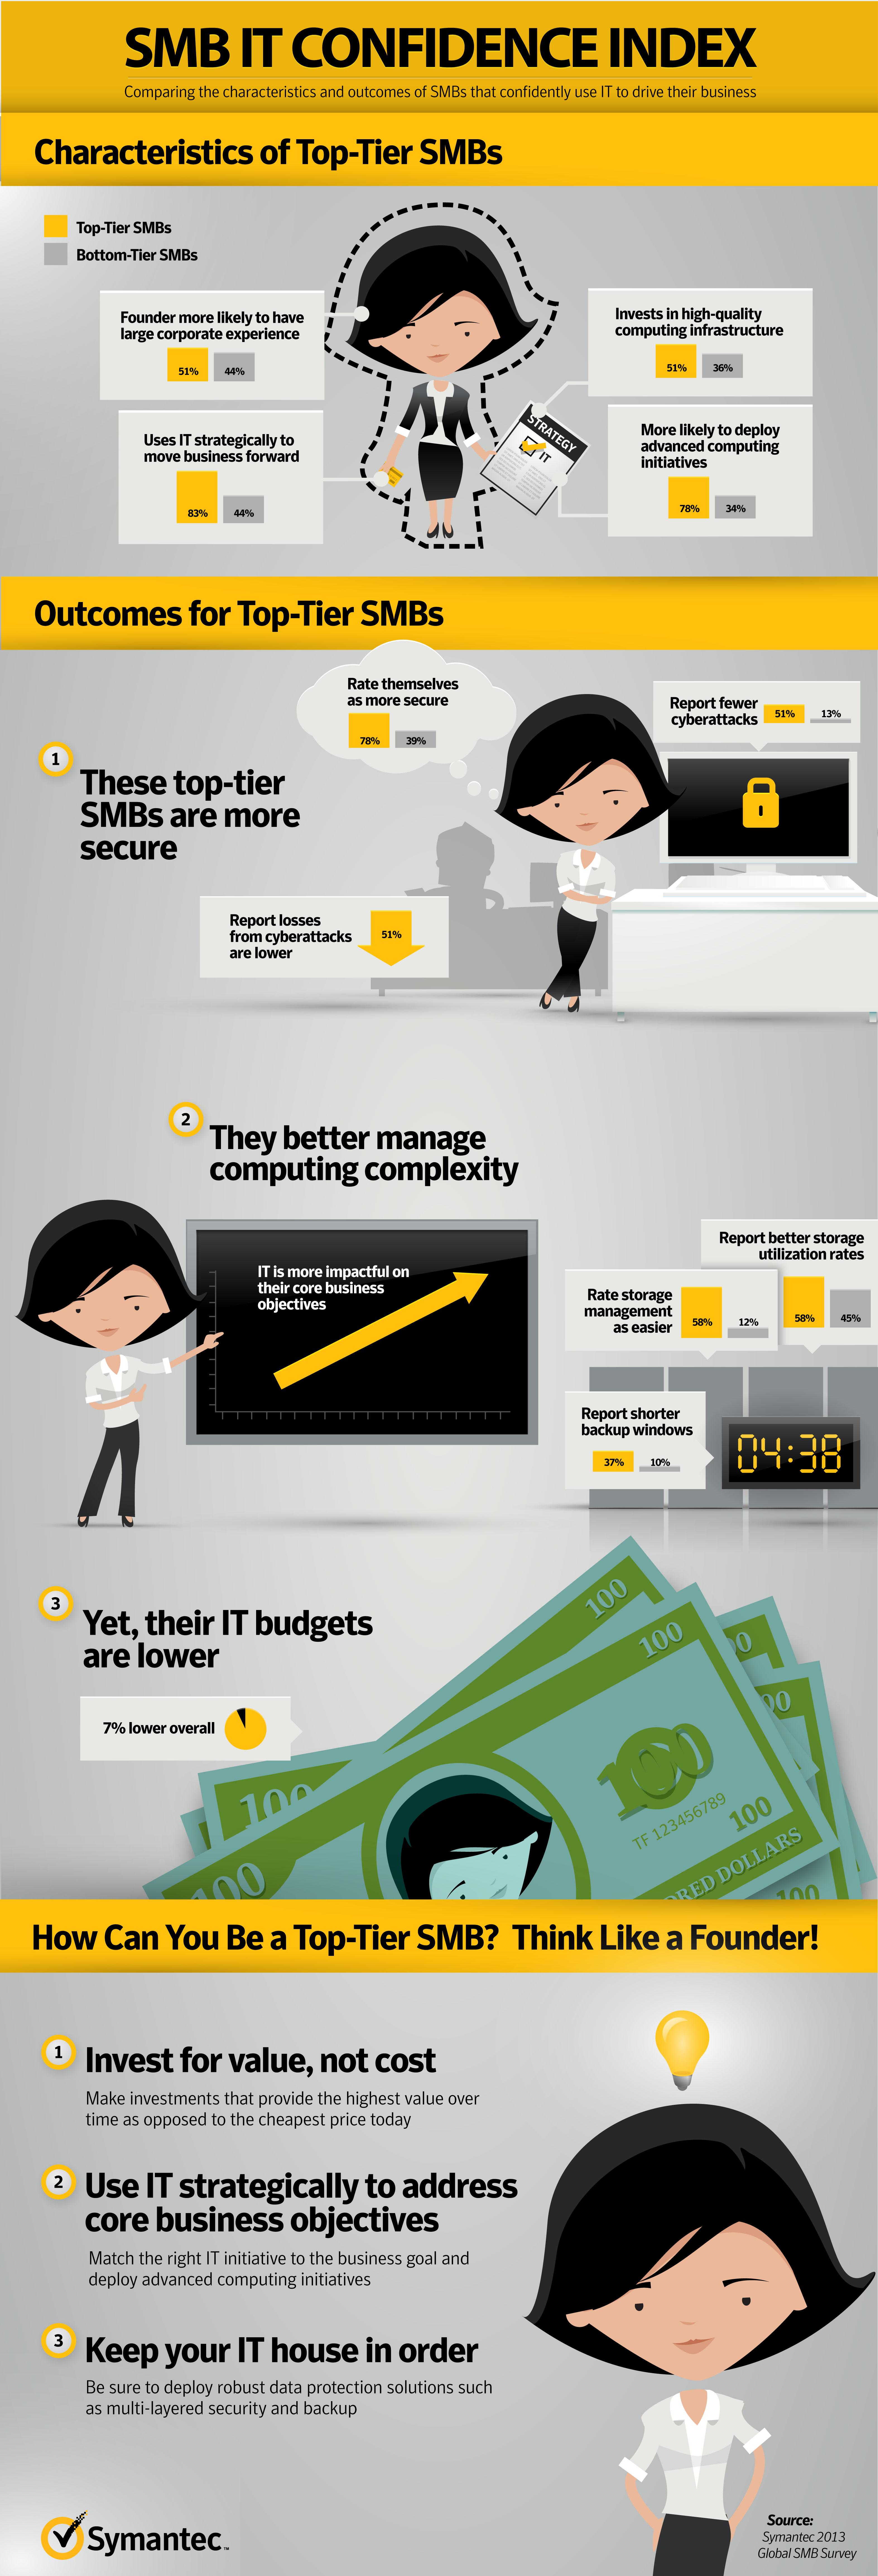 Symantec 2013 SMB Survey Infographic